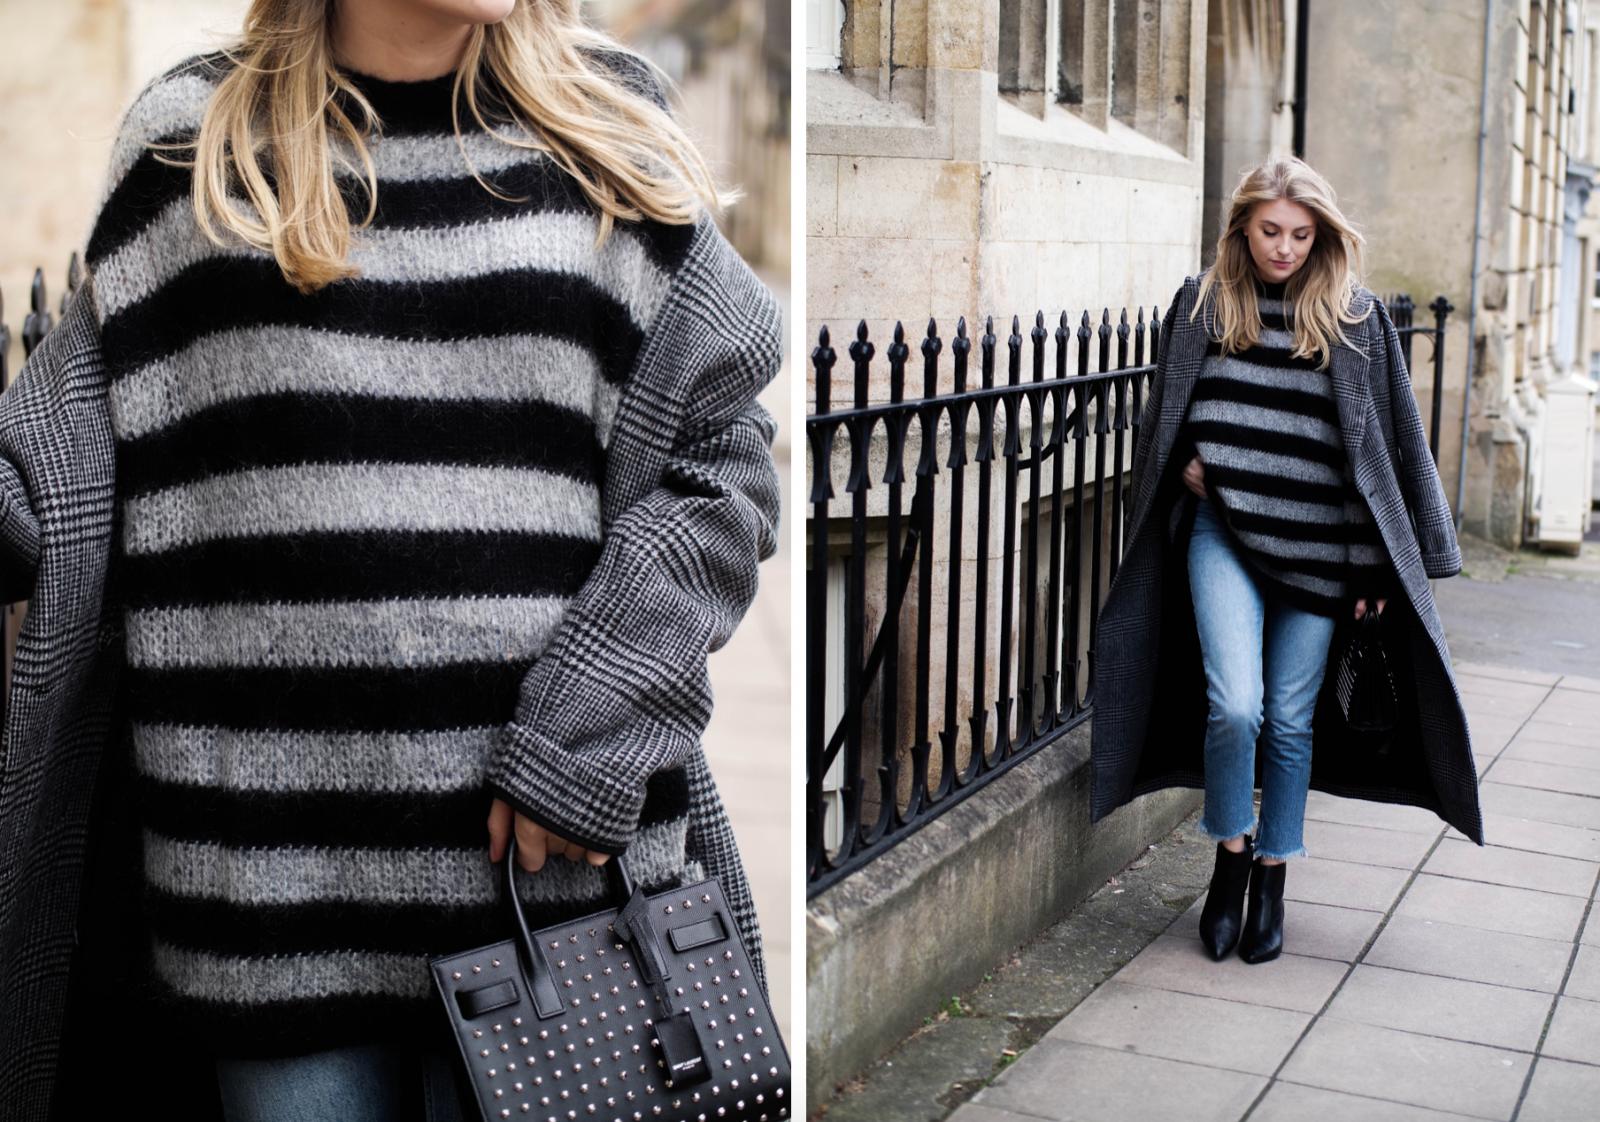 Relatable Blogger - Fashion Blogger Street Style